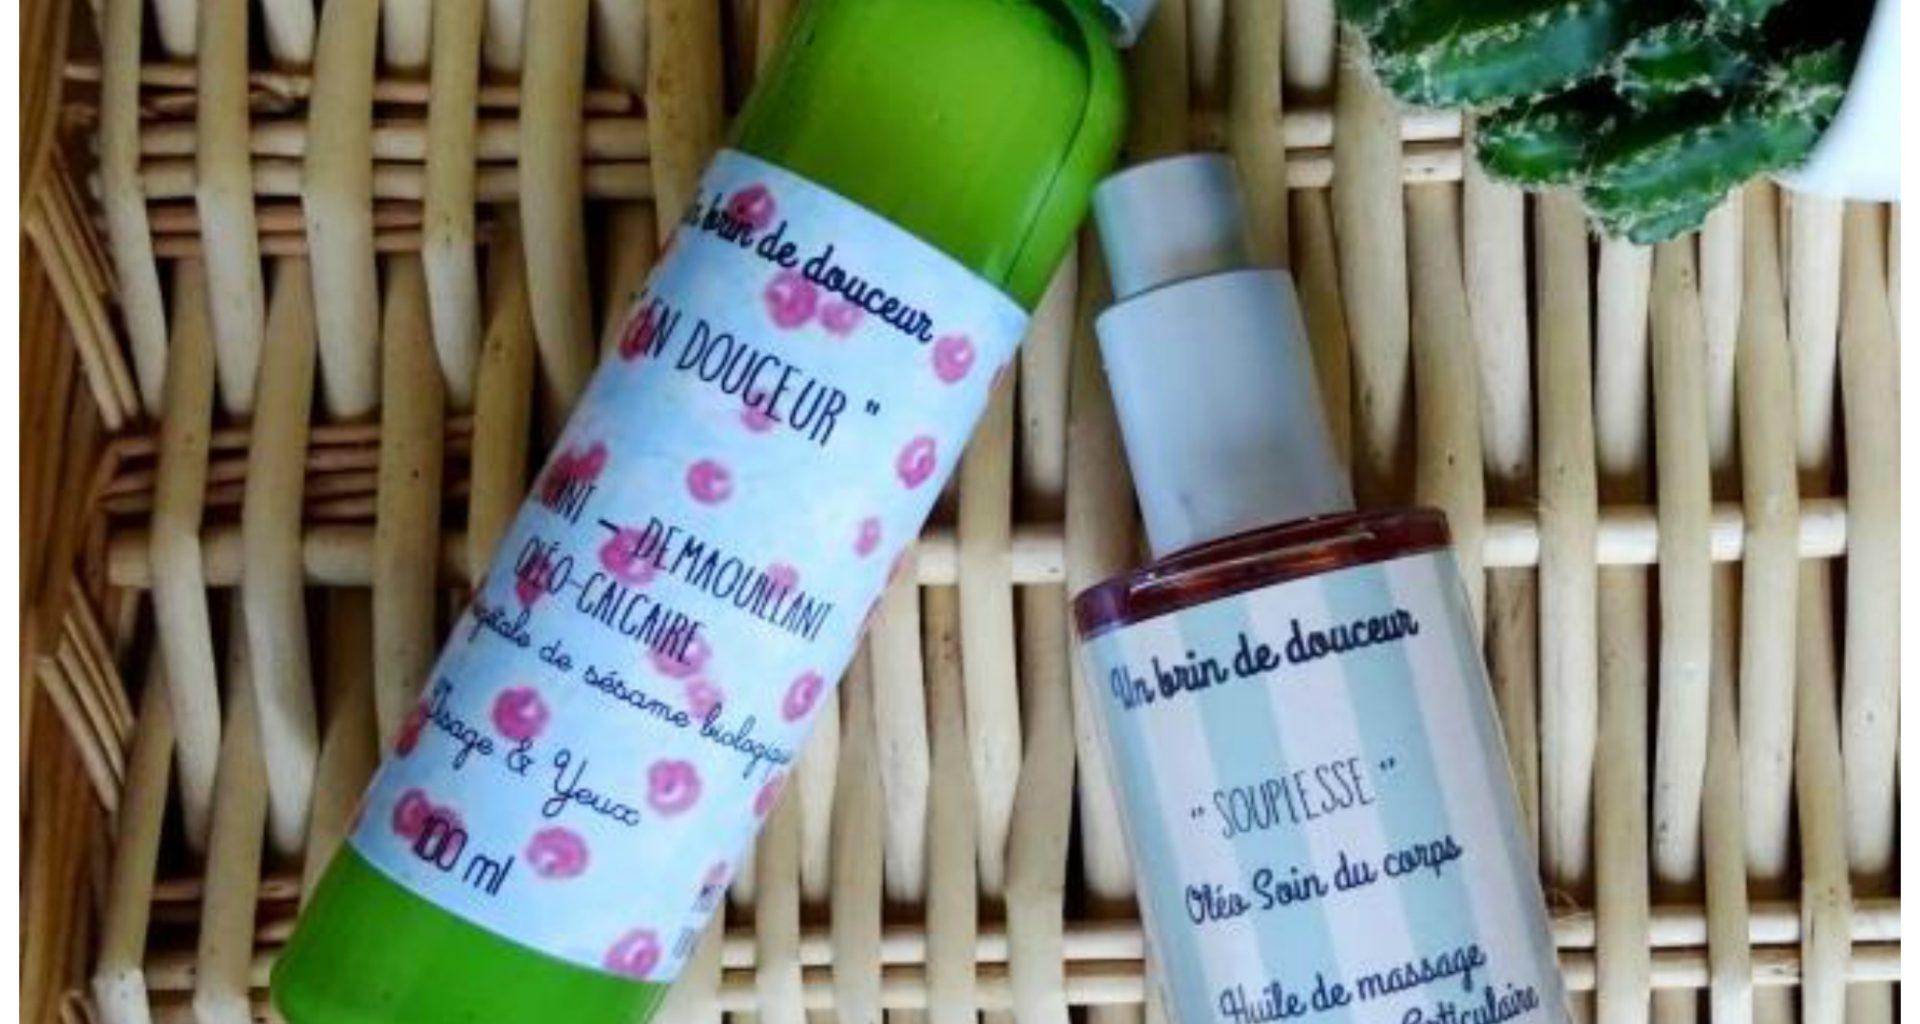 cosmétique naturel made in france